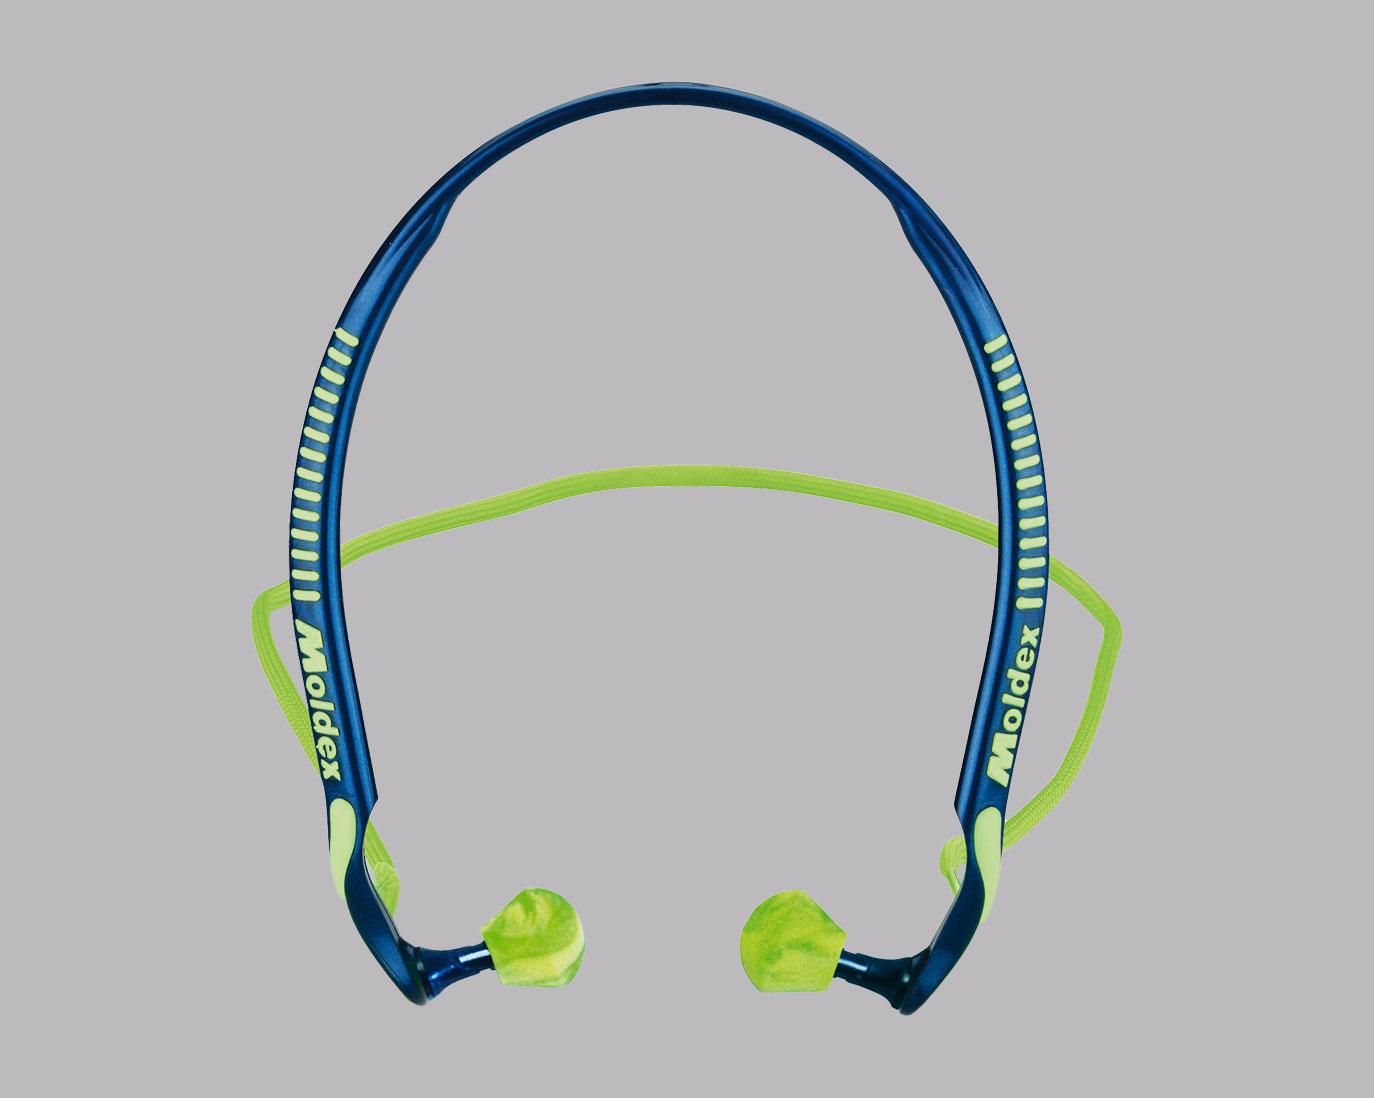 Headband Ear Plugs